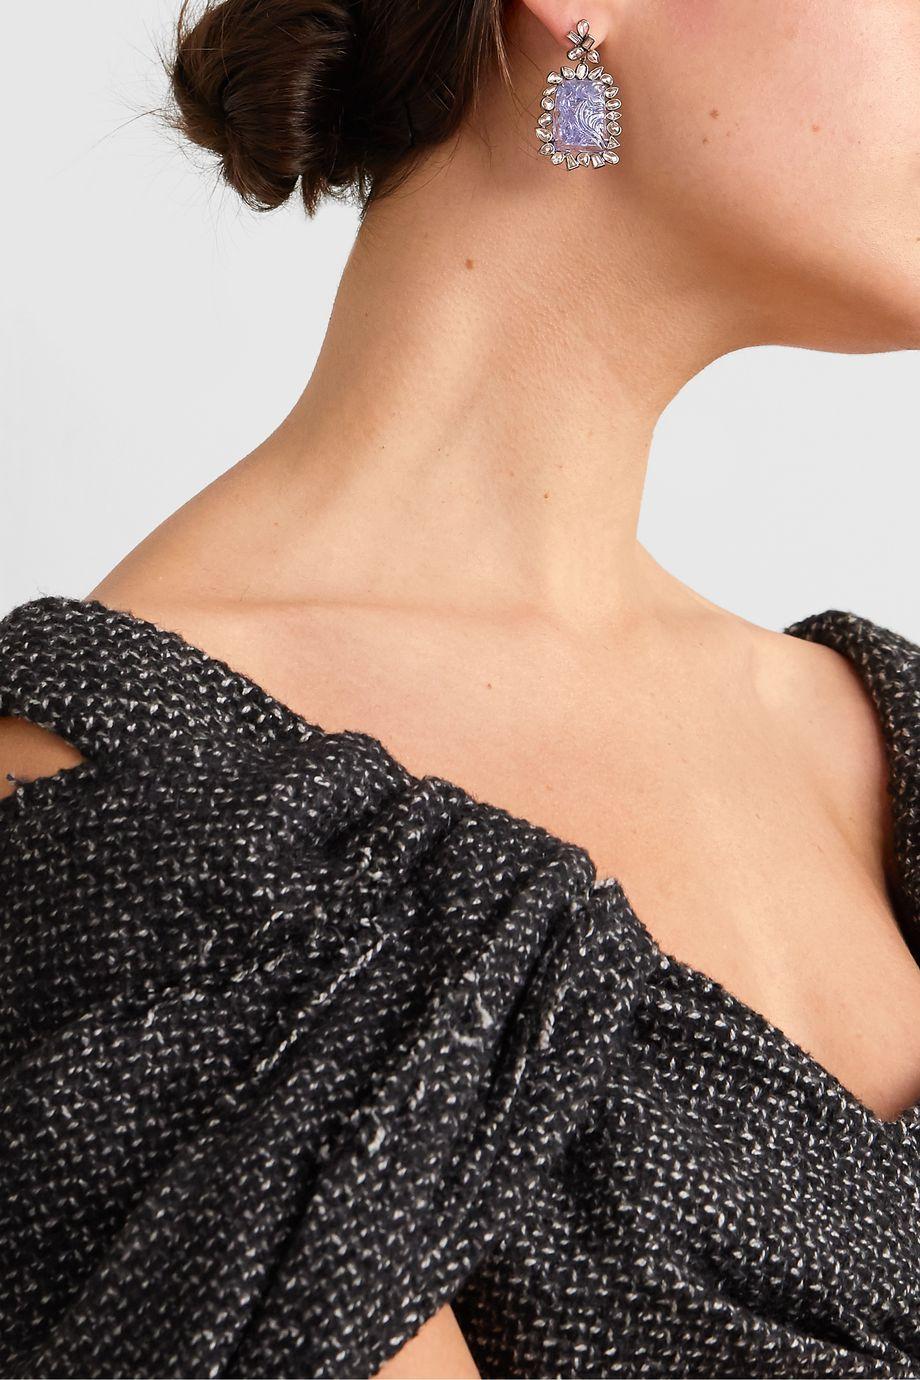 Kimberly McDonald Blackened platinum, tanzanite and diamond earrings